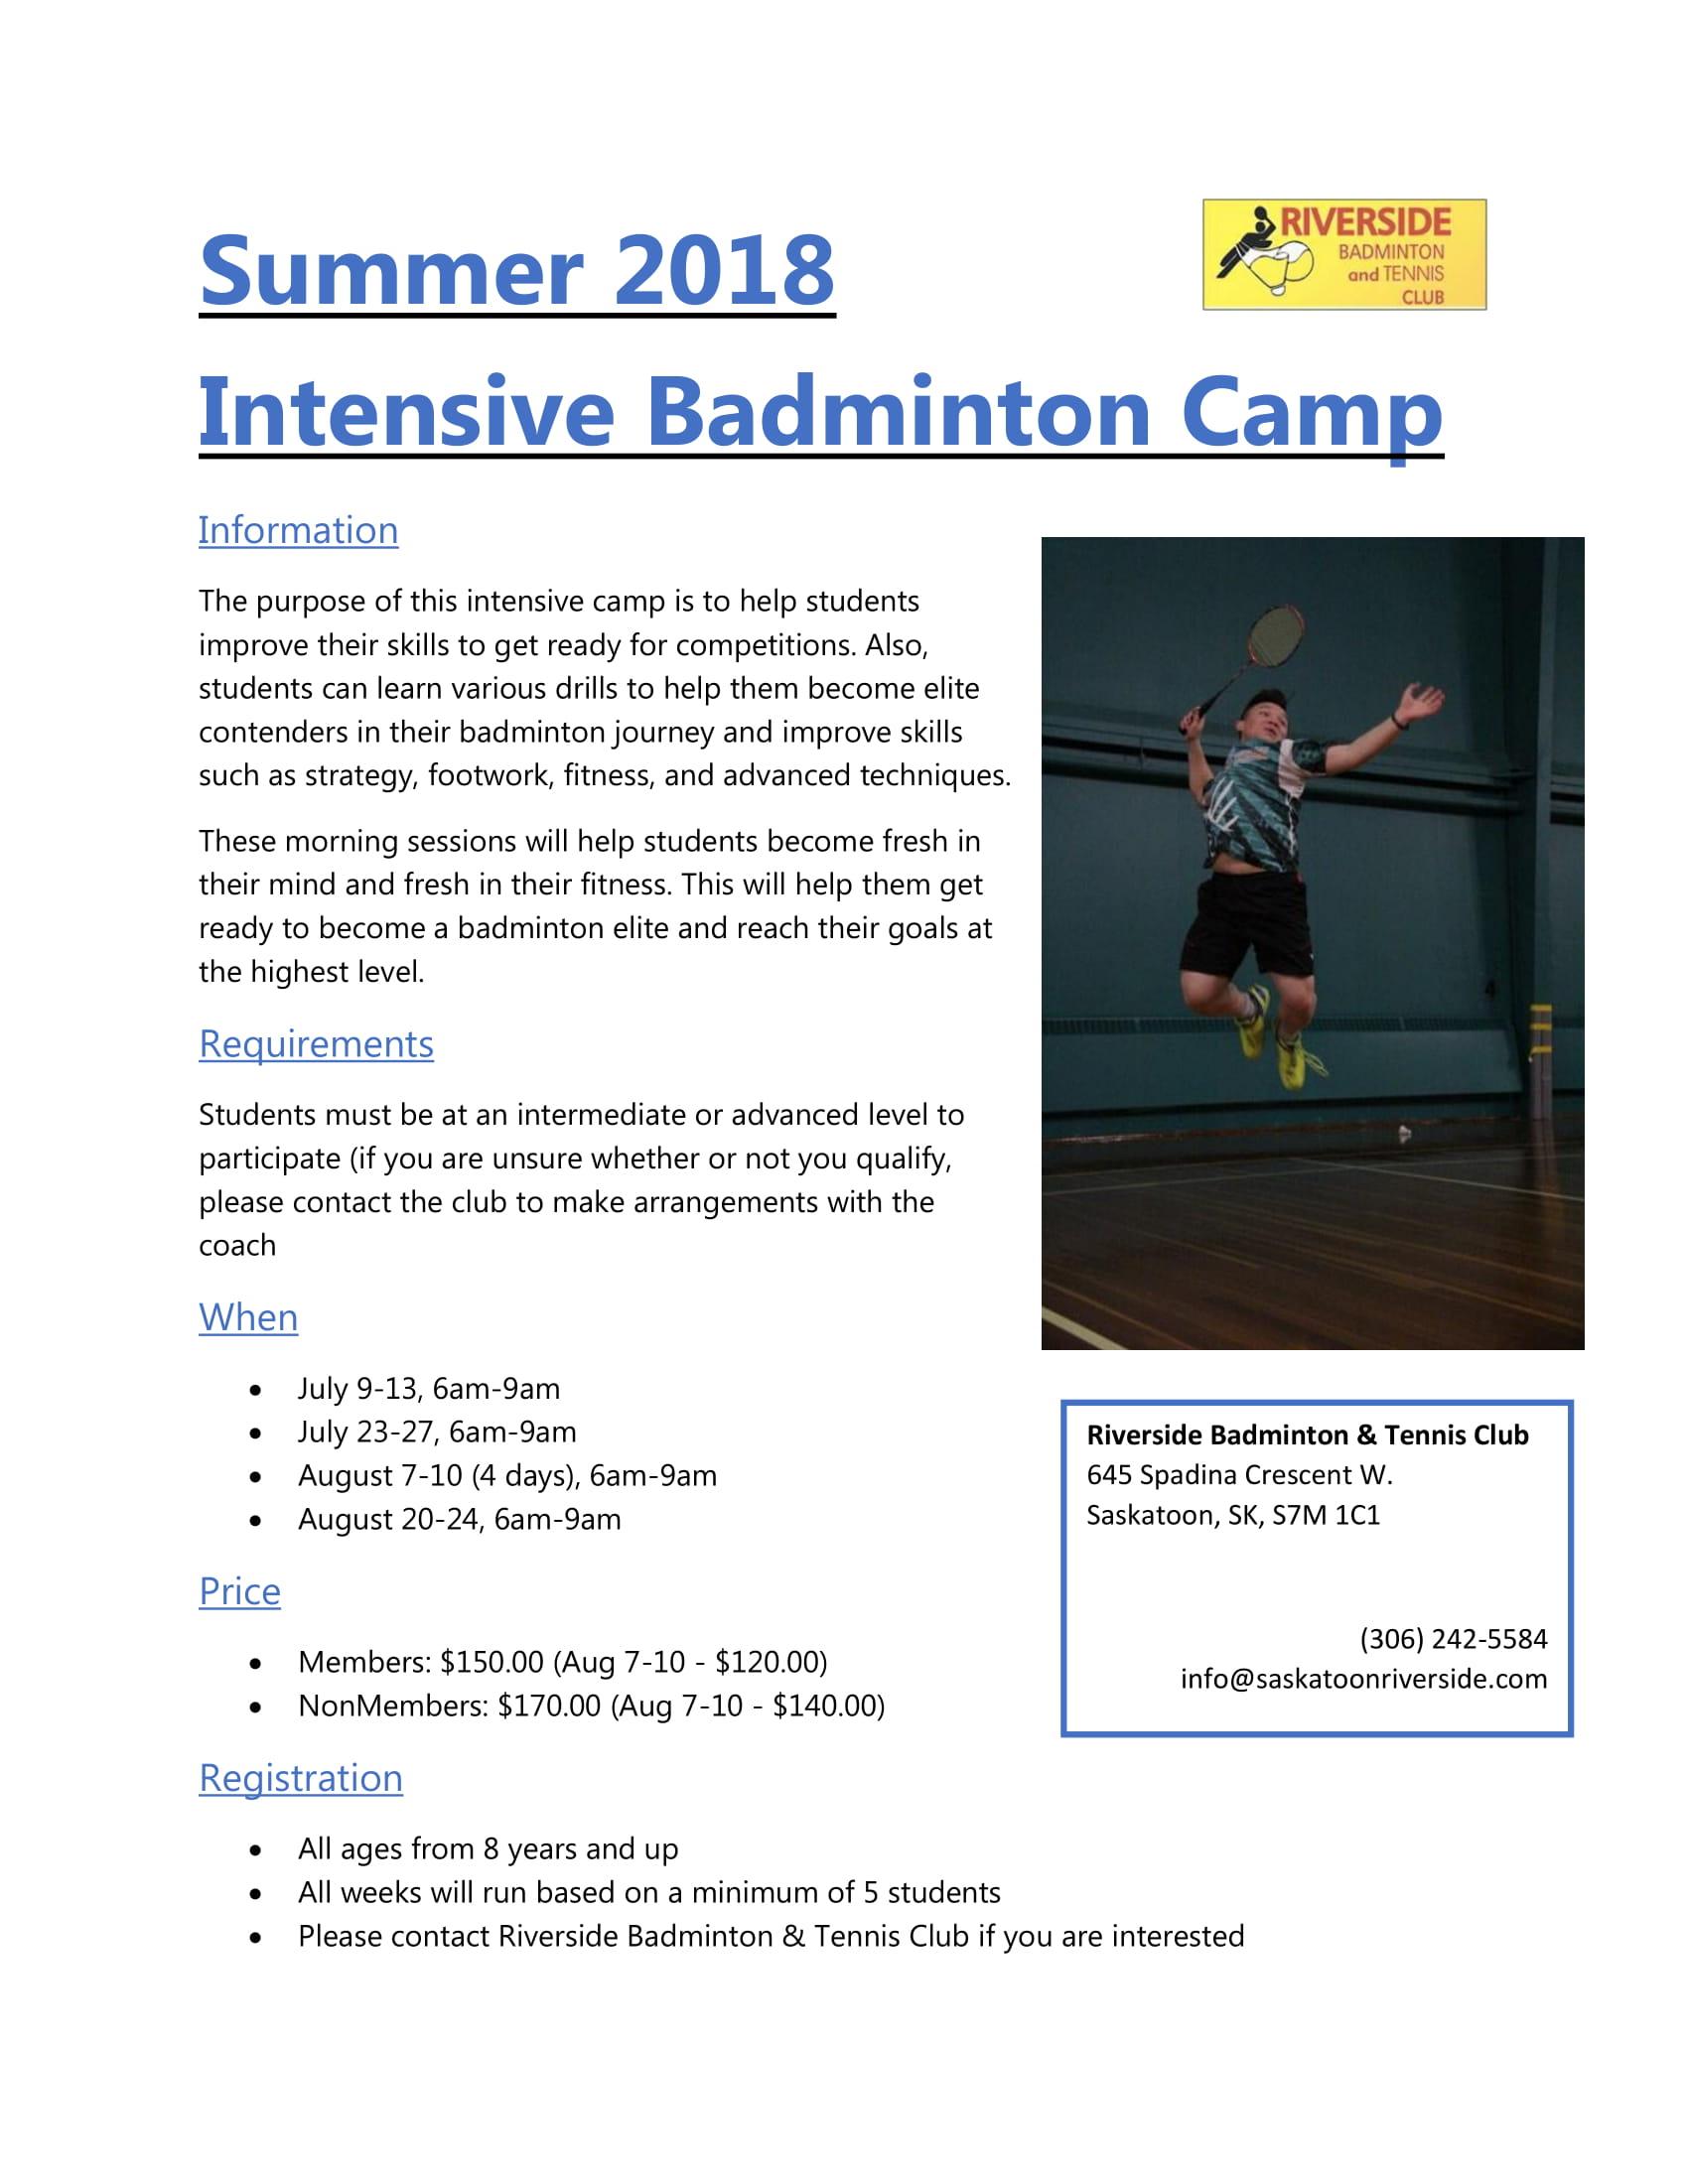 Summer 2018 Intensive Badminton Camp-1.jpg